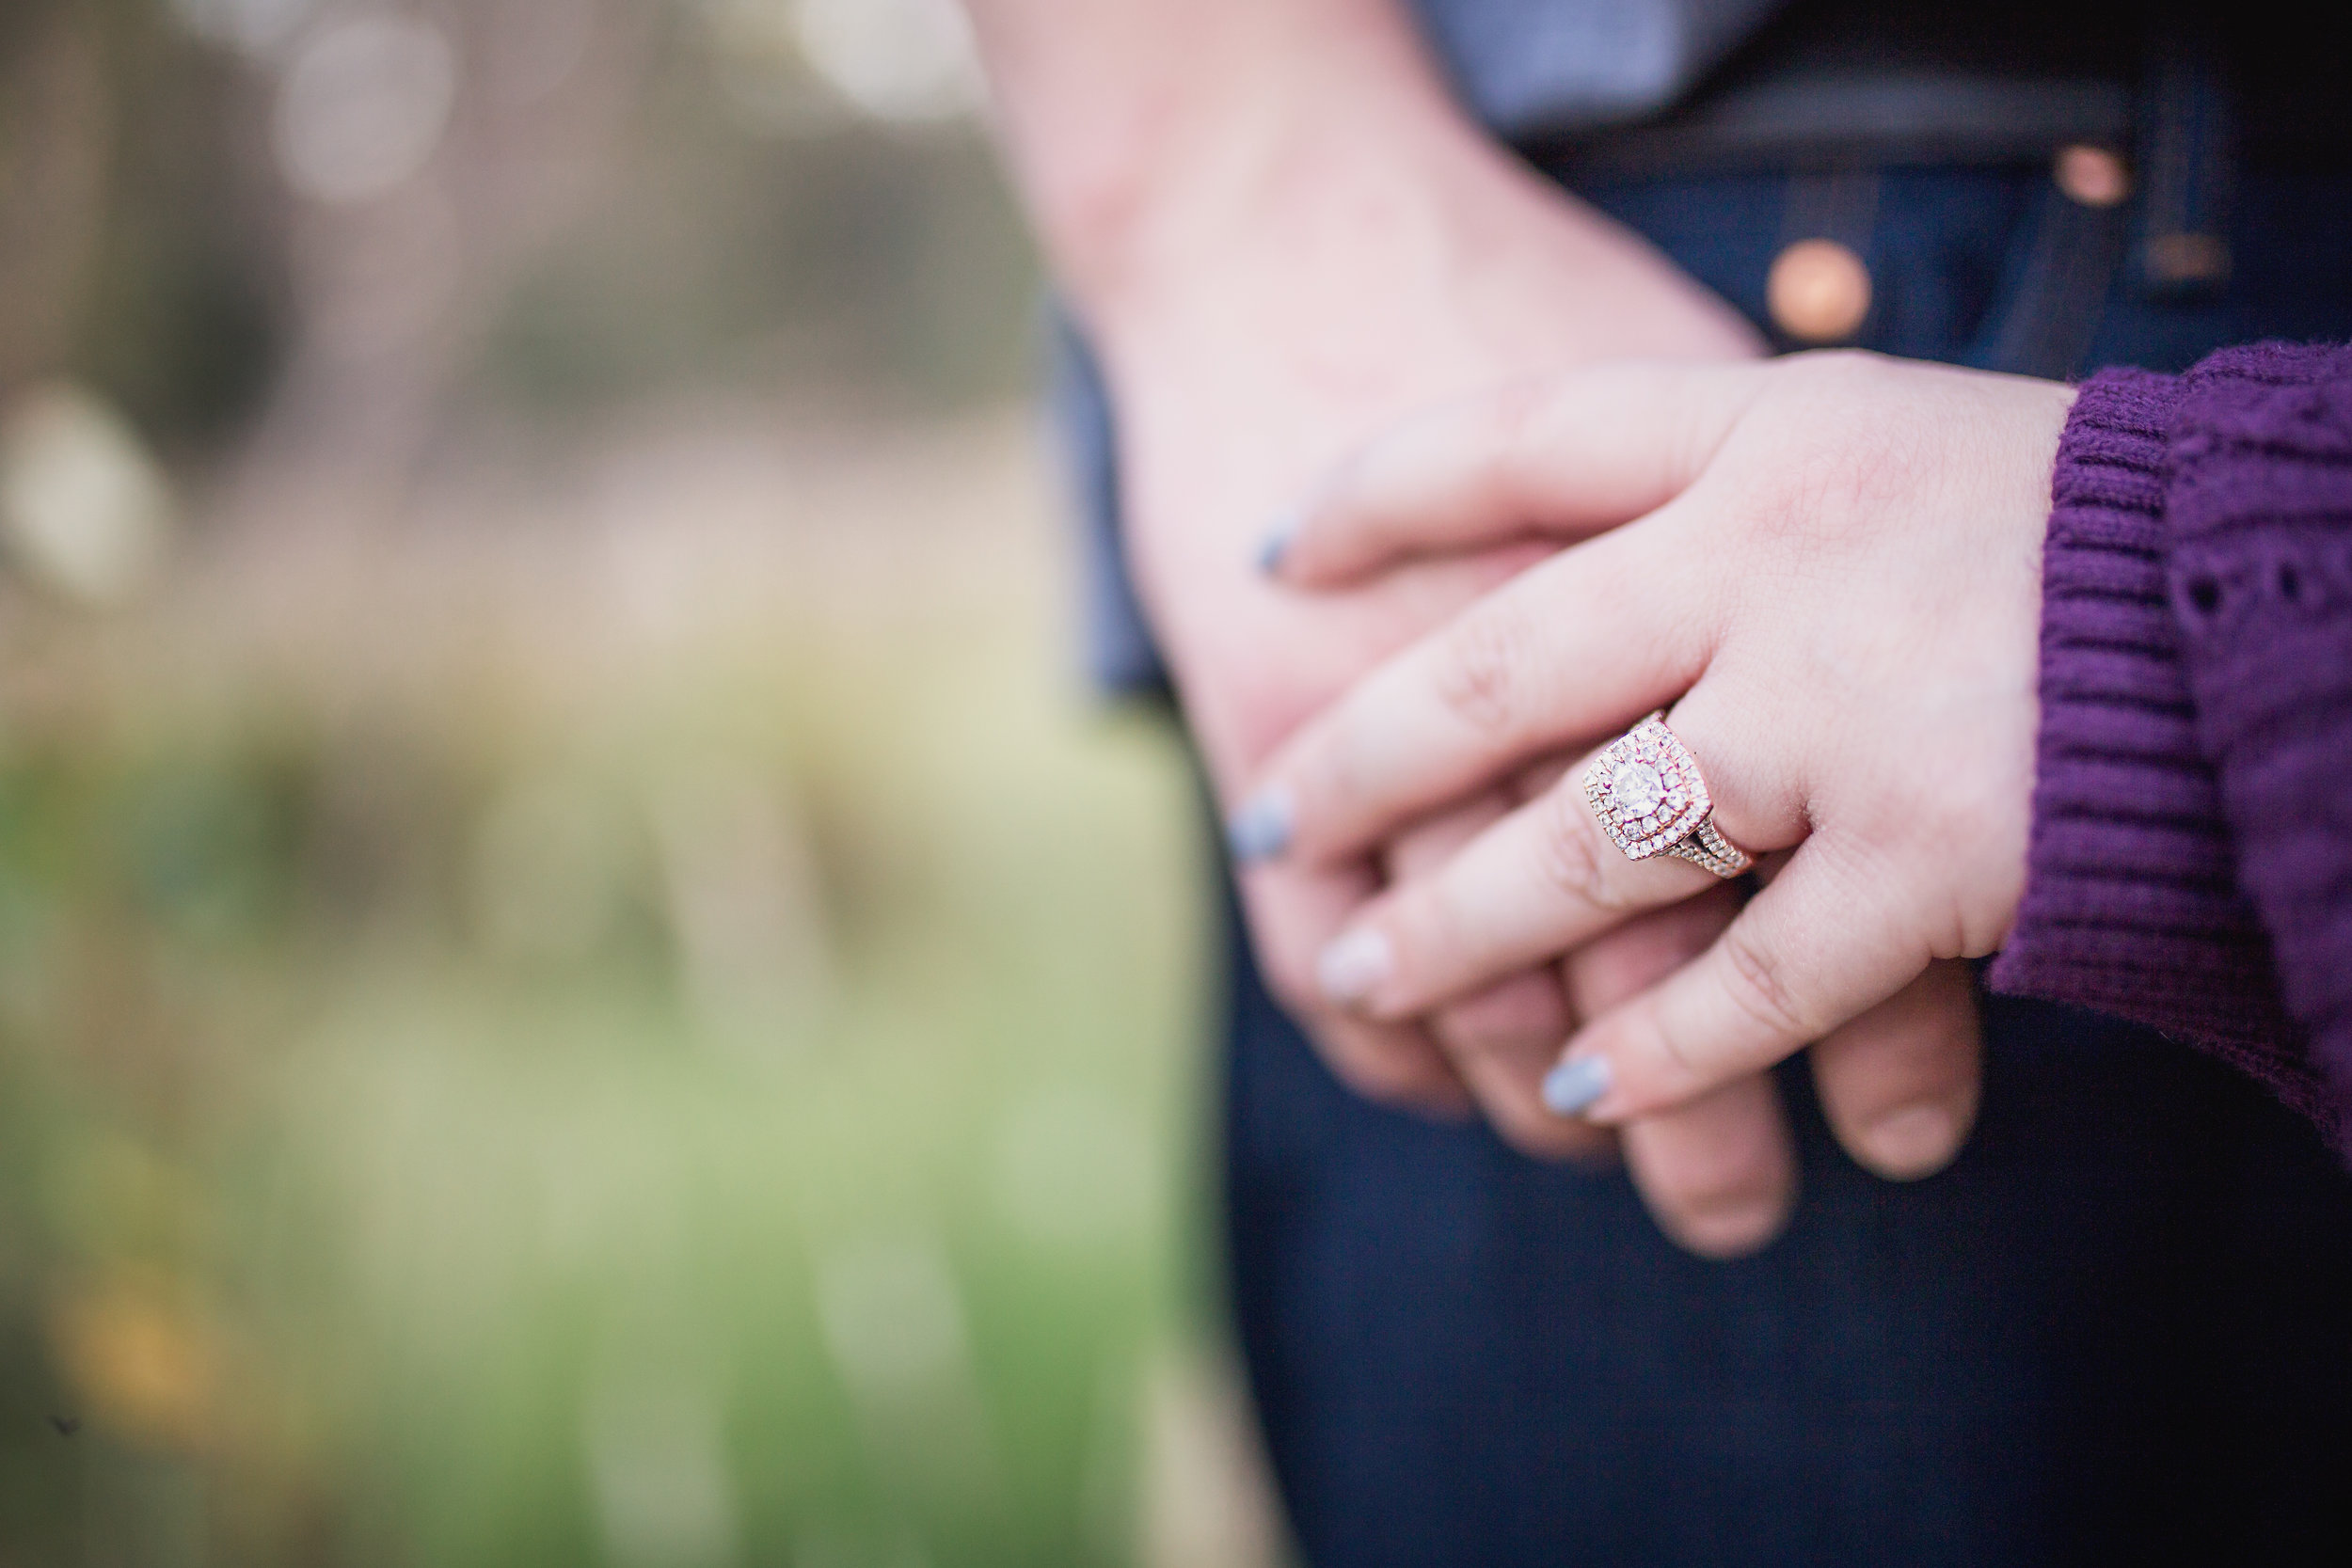 The beautiful ring